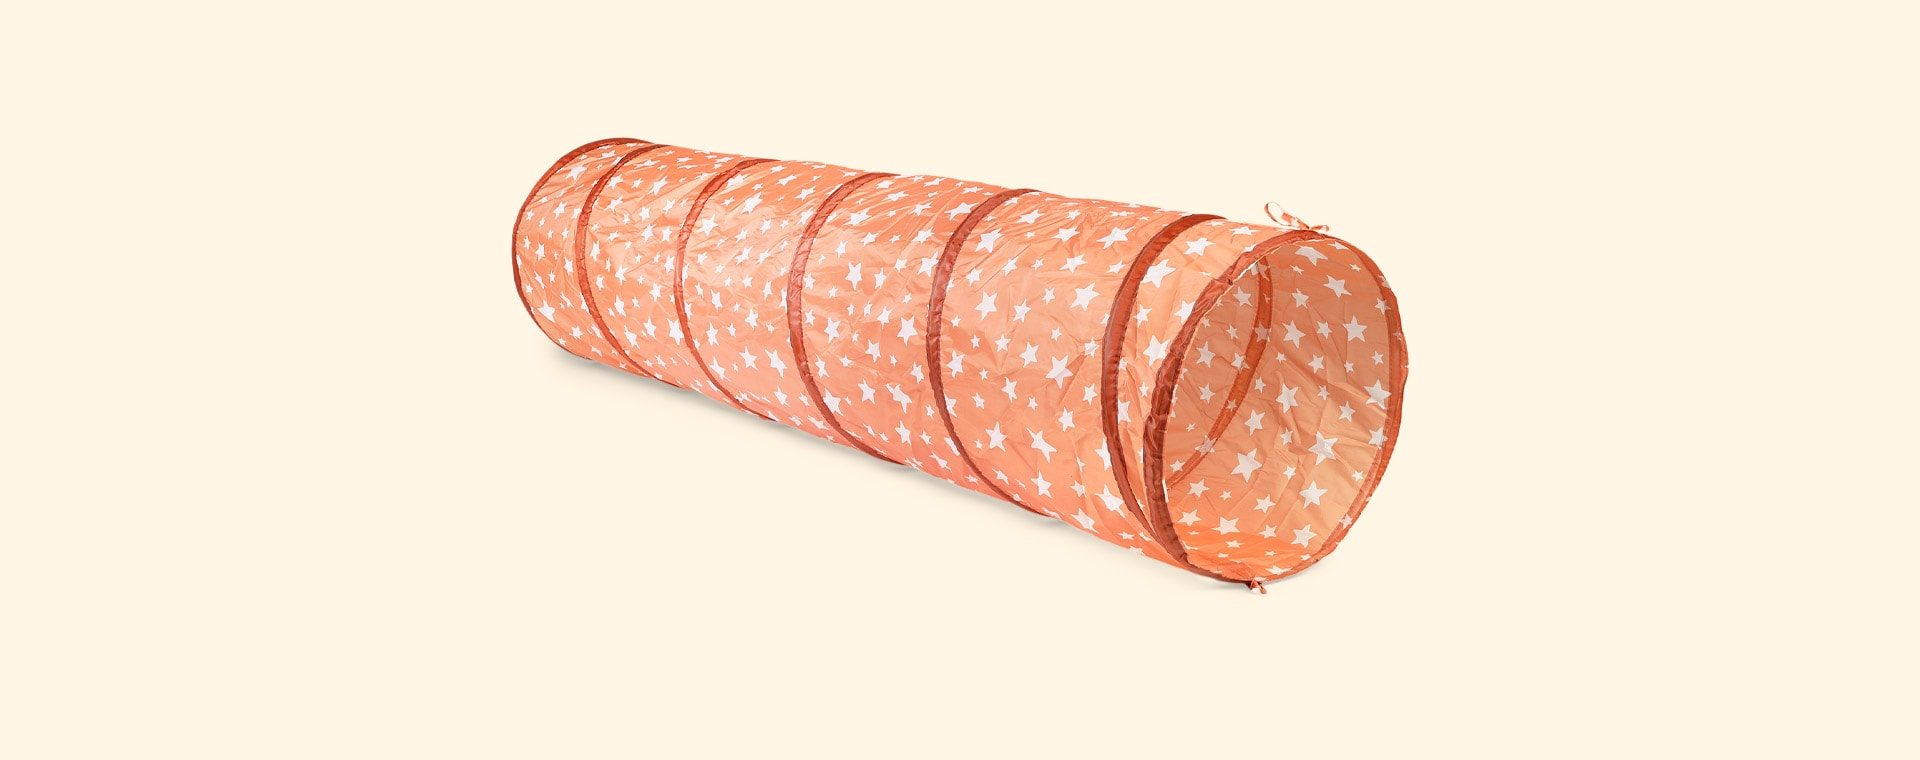 Orange Kid's Concept Play Tunnel